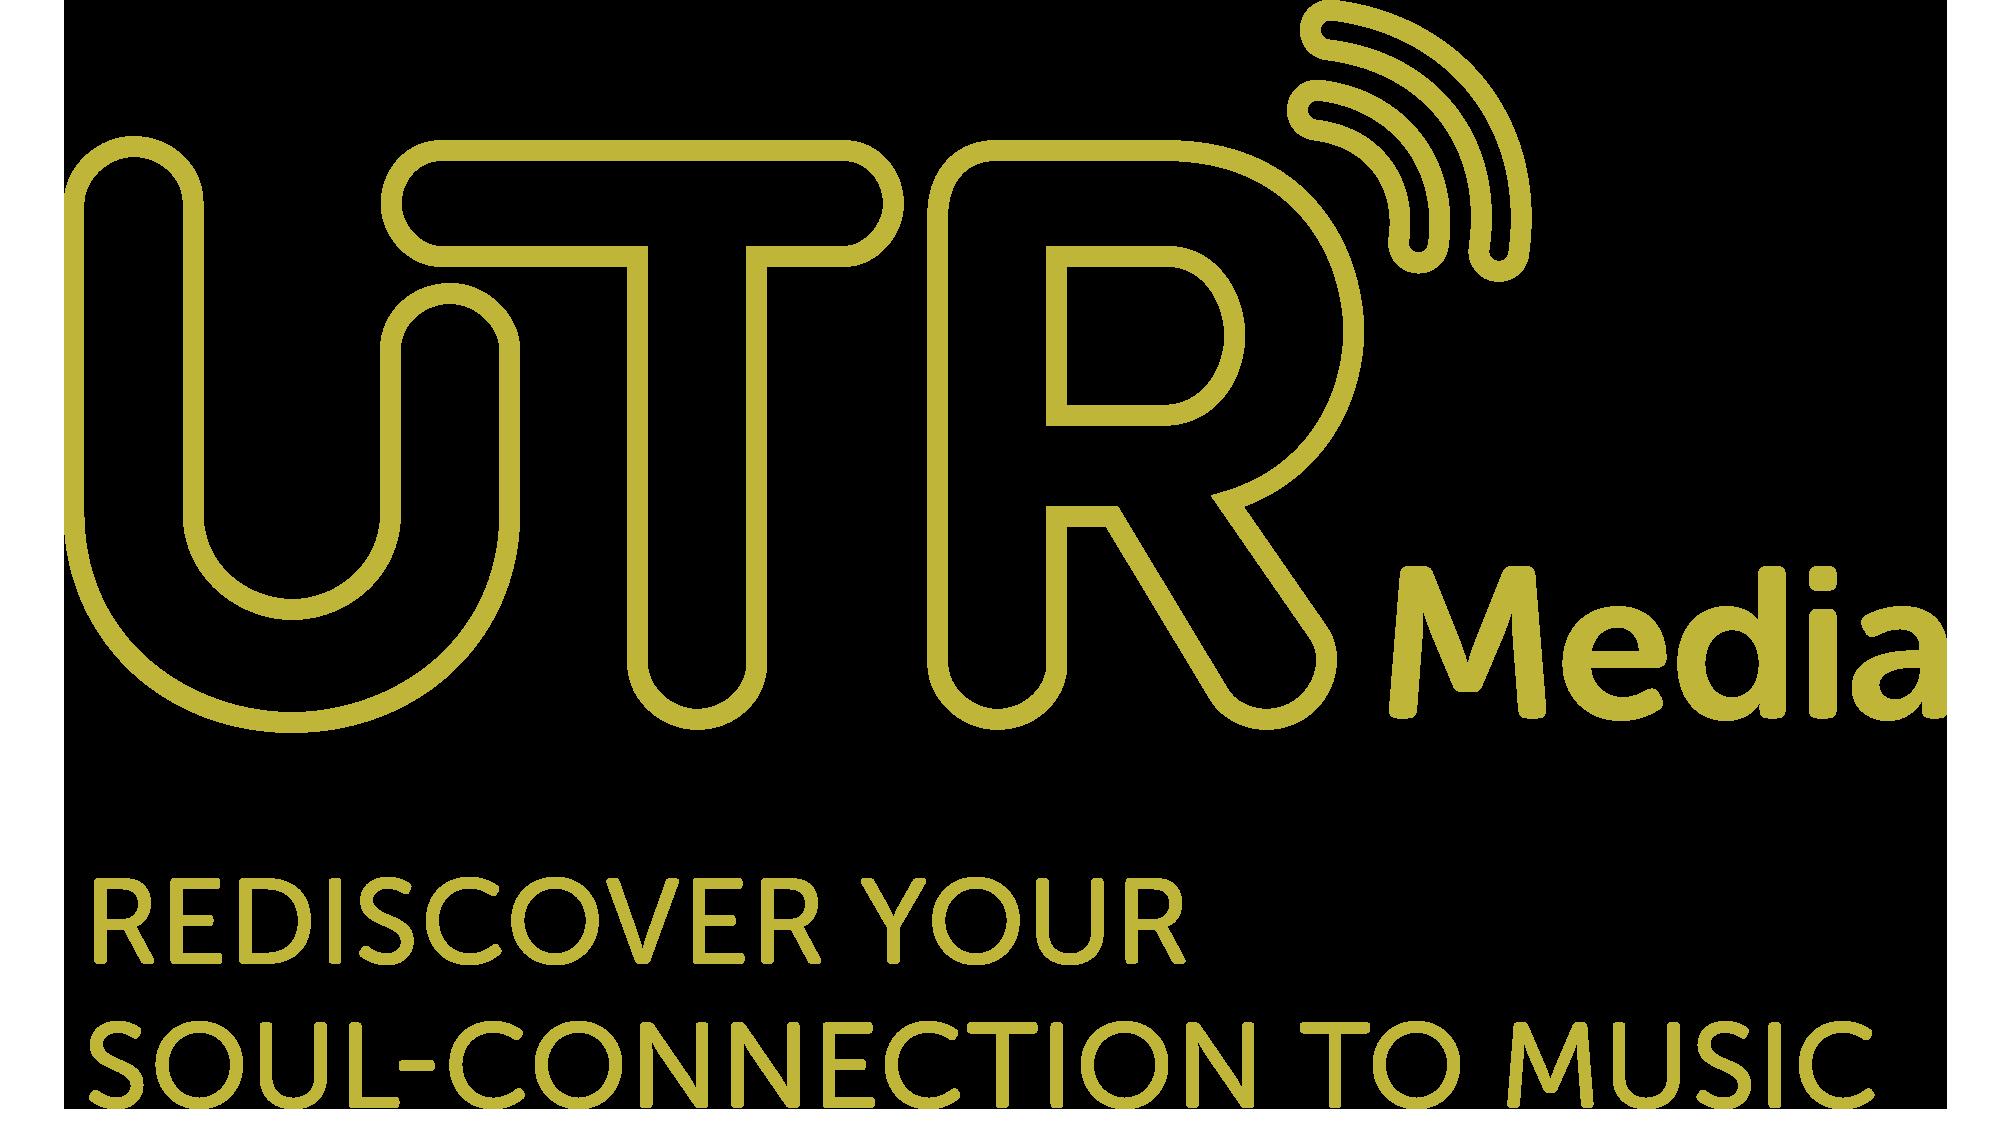 Gourmet Music Podcast – UTR Media